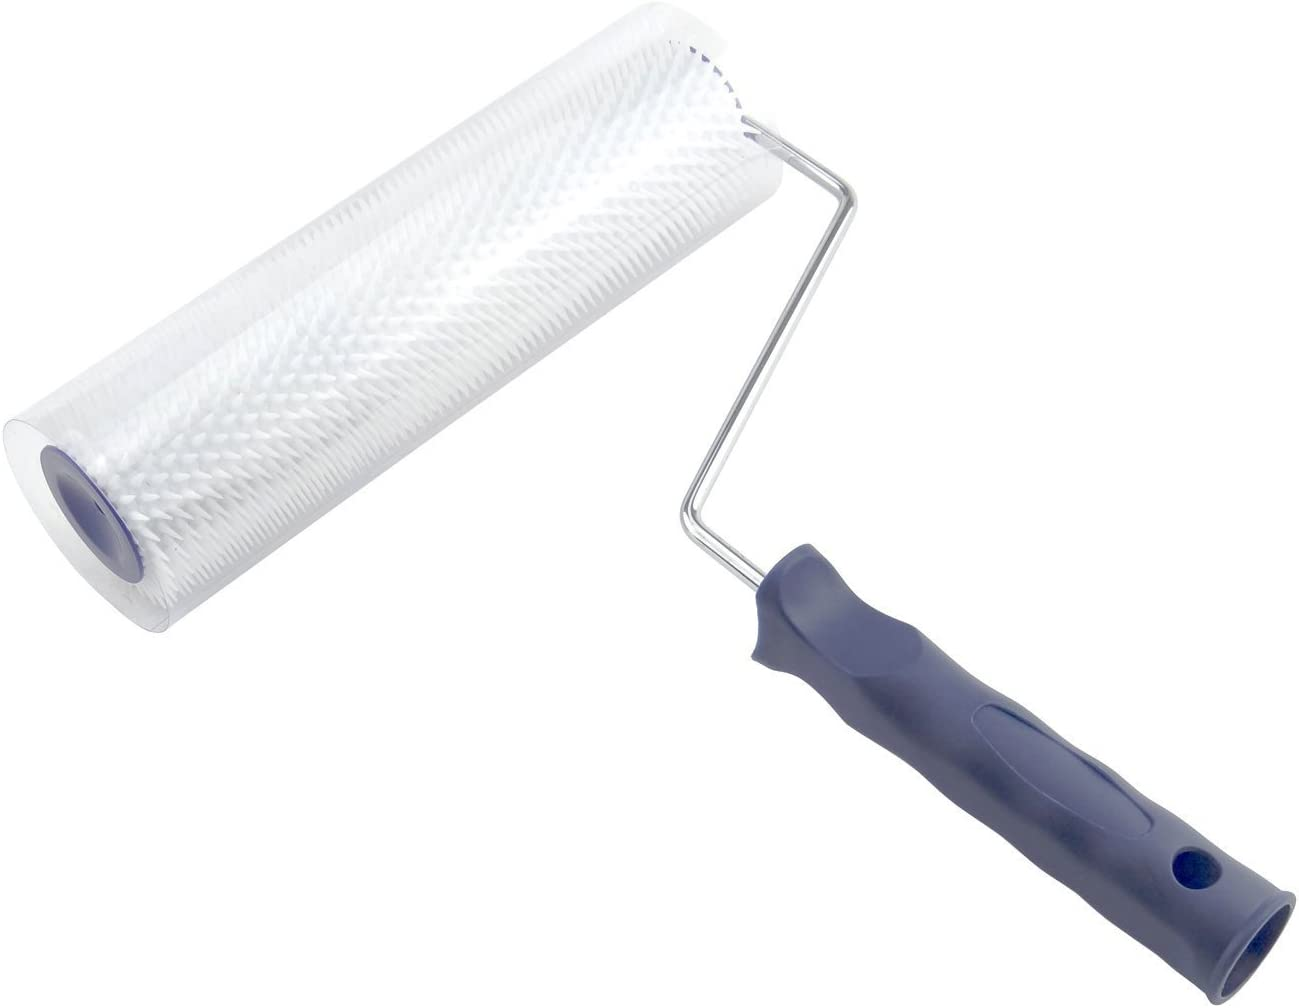 BTMB 23cm/9'' Aeration Latex Floor Self Leveling Screed Spiked Roller